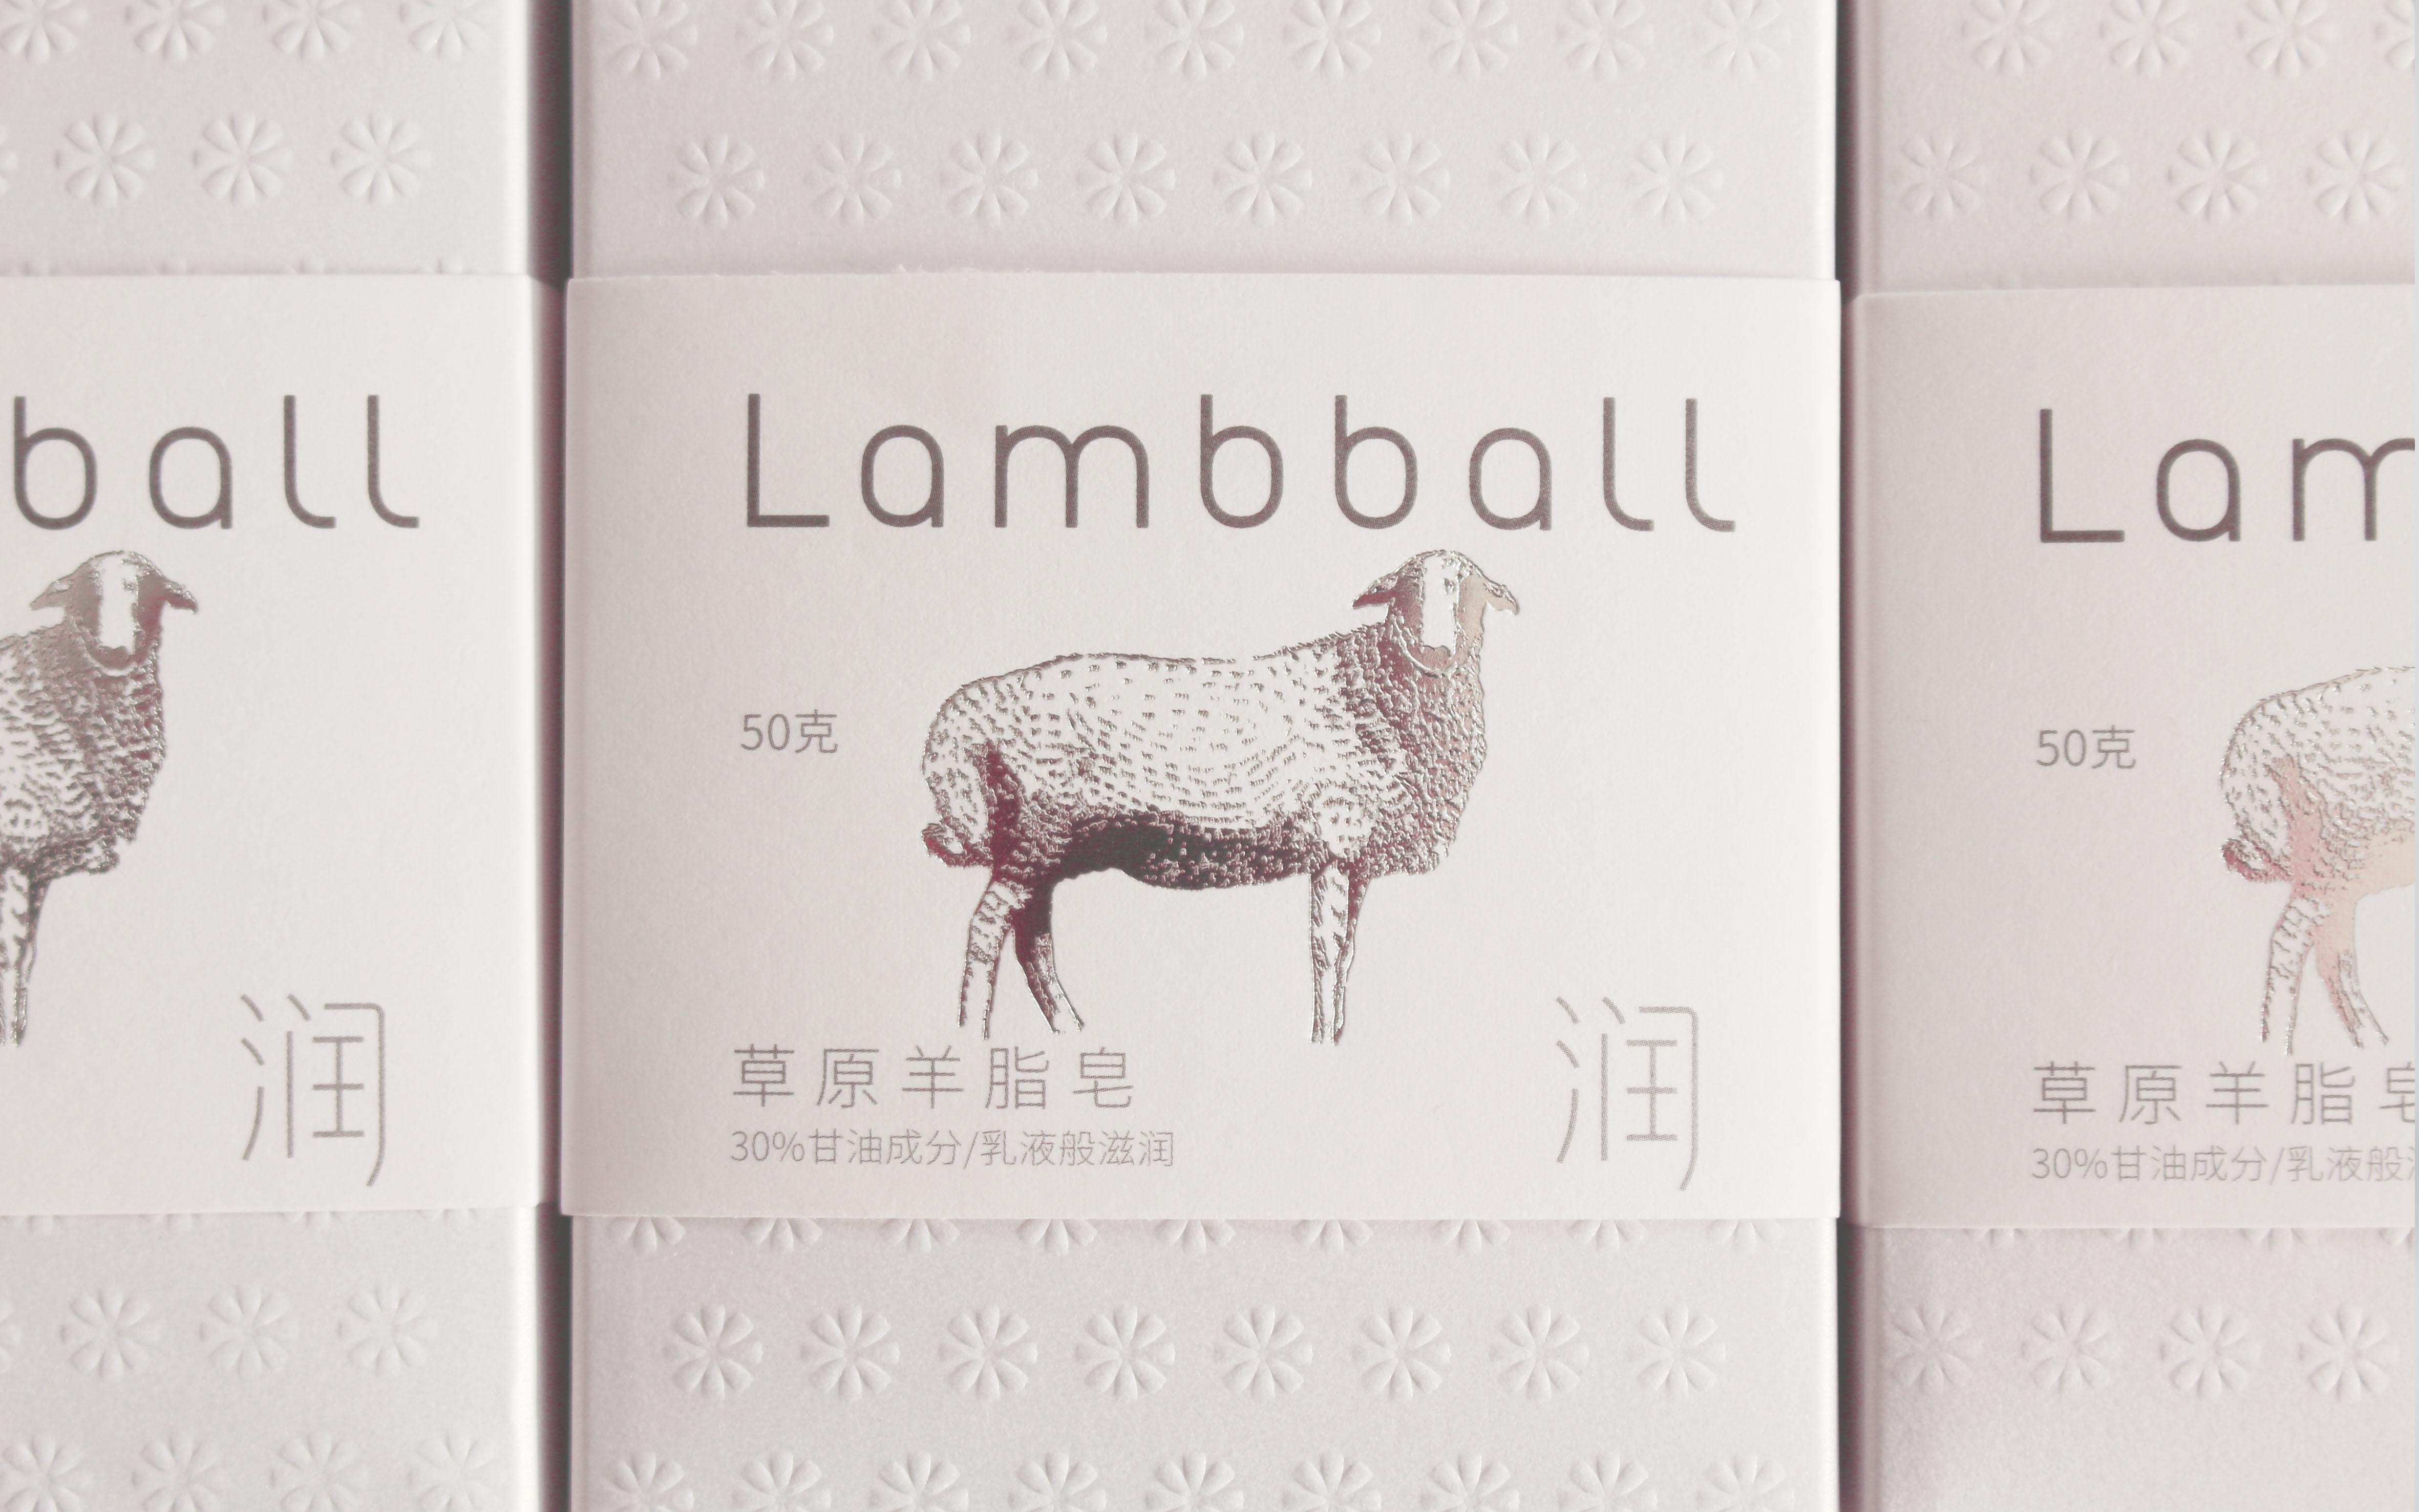 lambball羊脂皂包装设计 第12张 lambball羊脂皂包装设计 蒙古设计